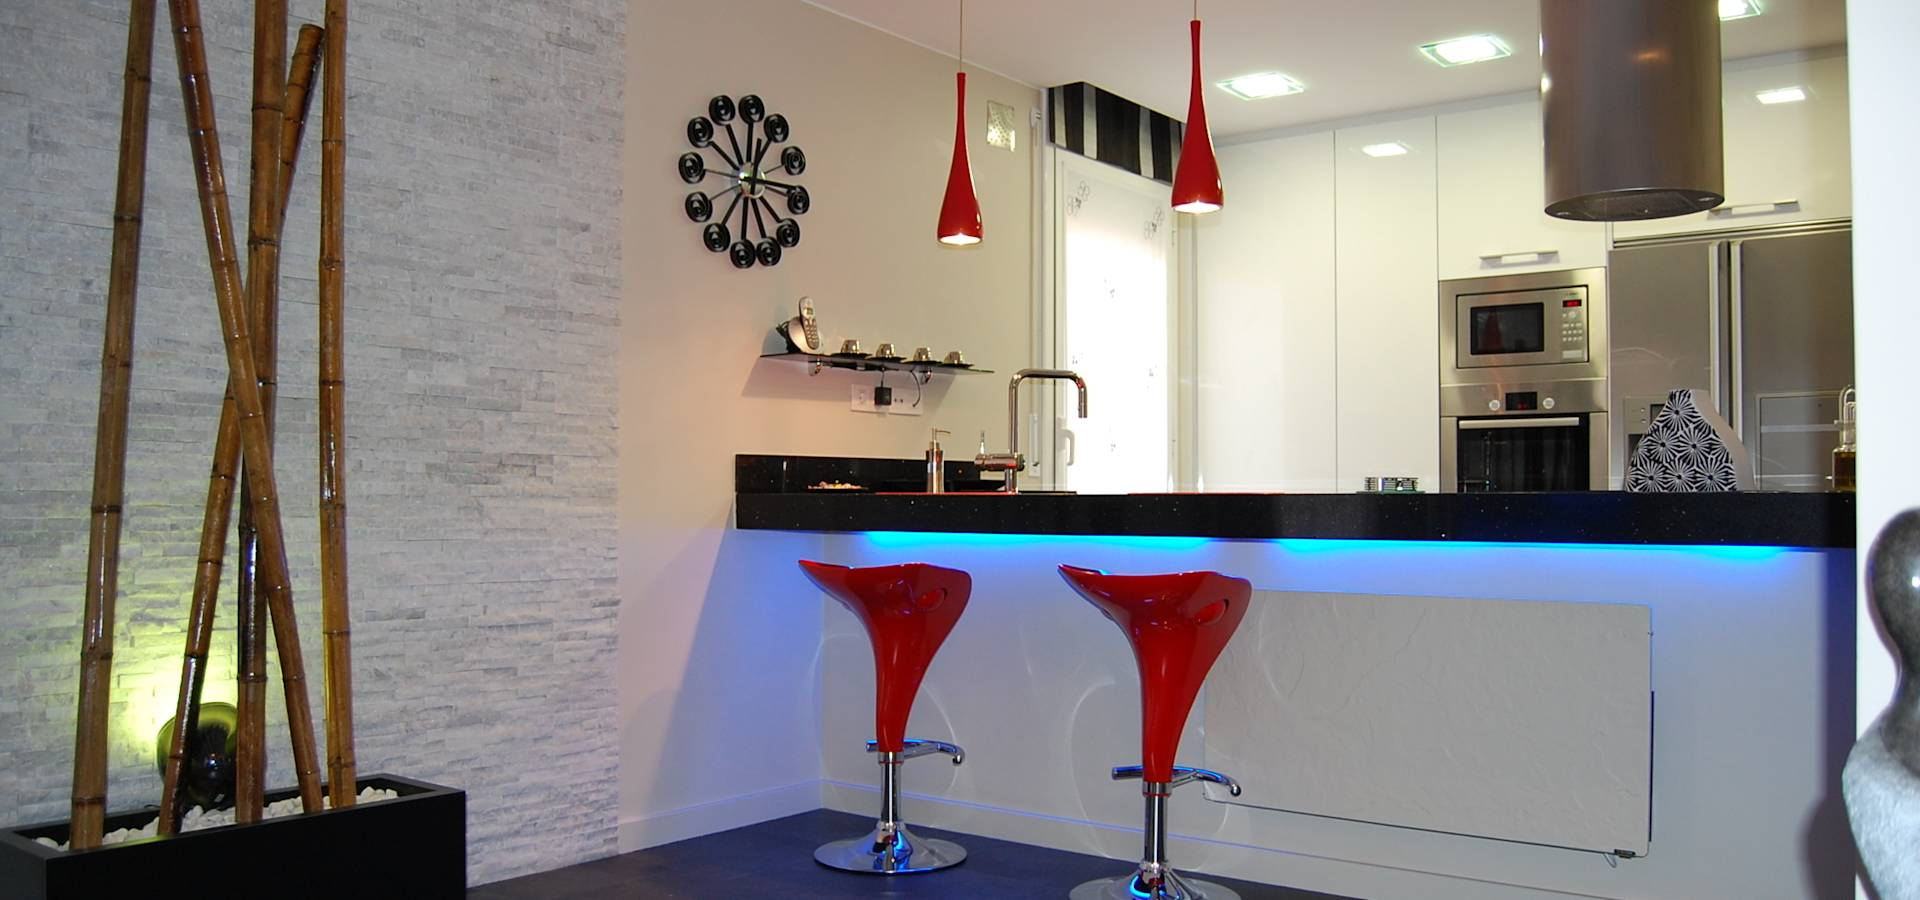 Sebasti n bayona bayeltecnics design decoradores y - Decoradores de interiores barcelona ...